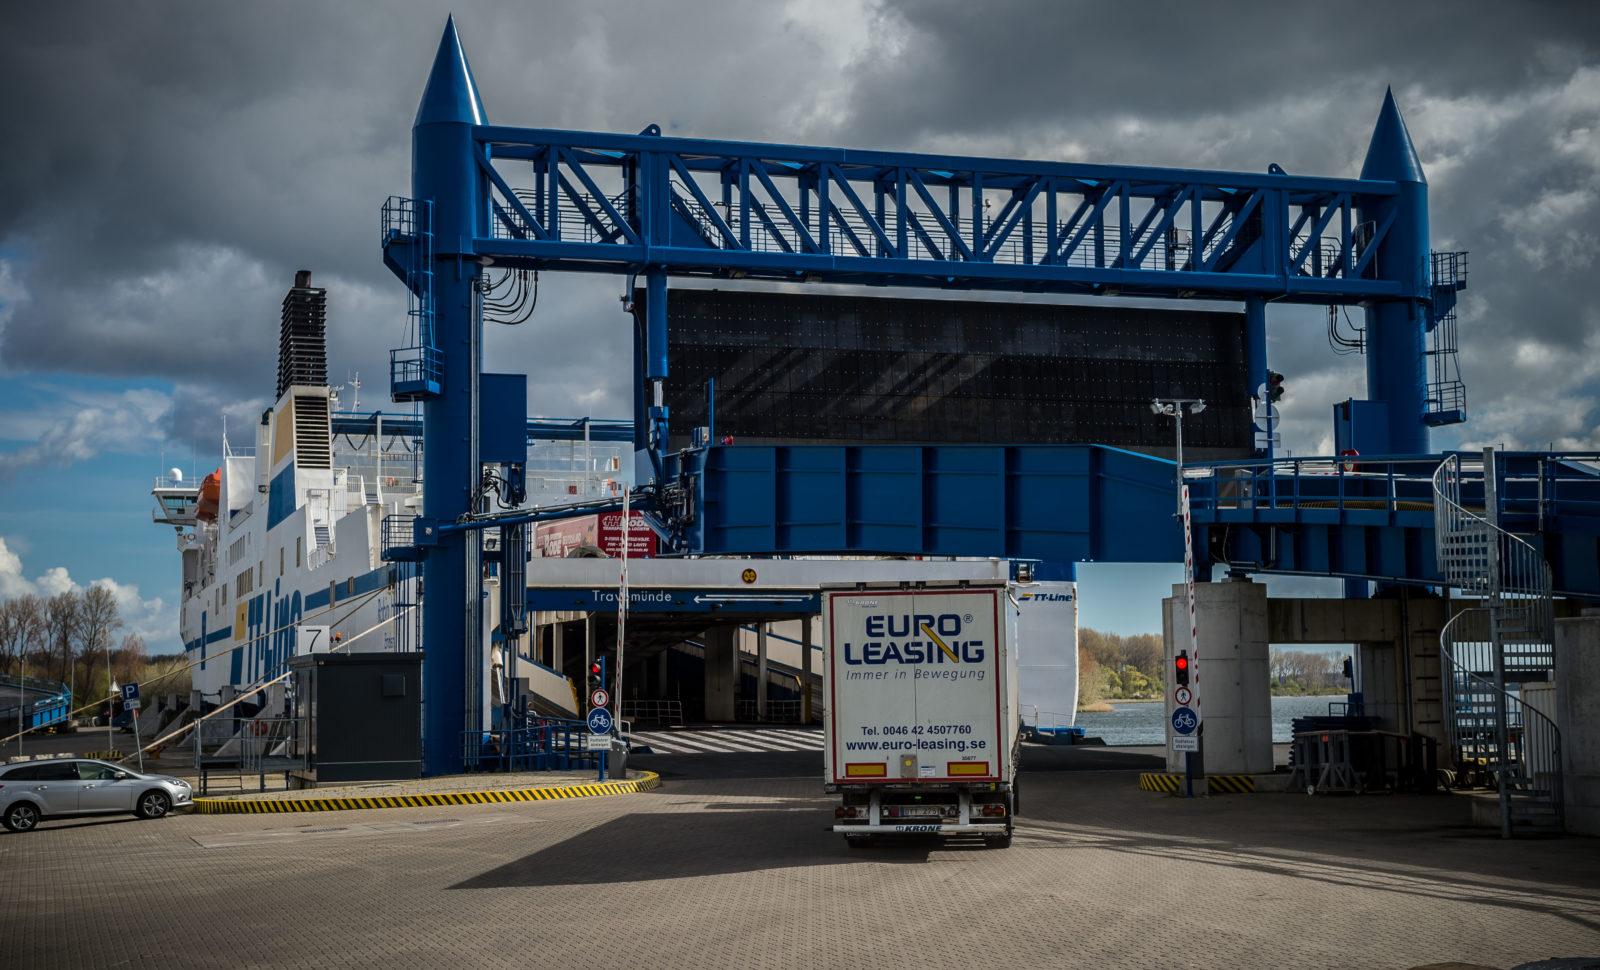 Neue Zugverbindung beschert dem Lübecker Hafen Mengenzuwachs